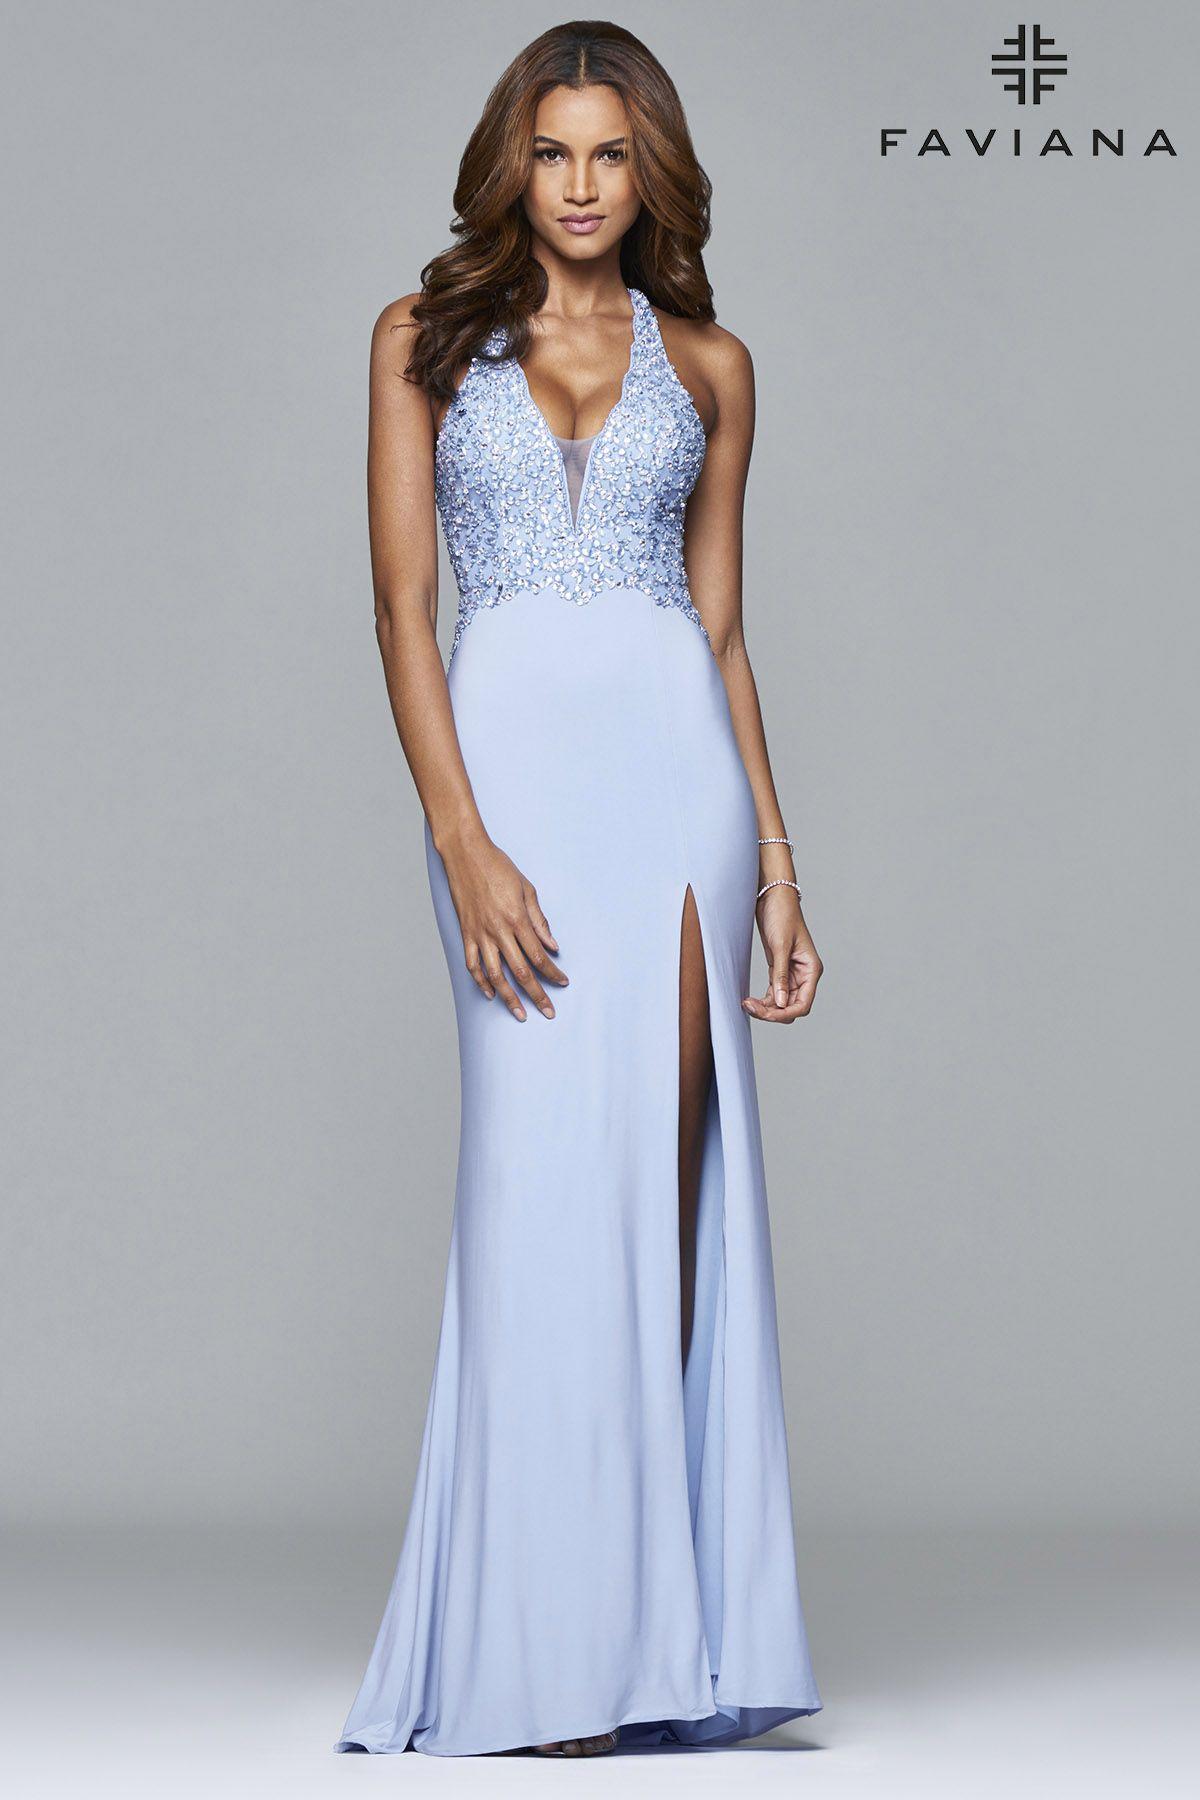 Faviana S9 - International Prom Association  Glamouröse